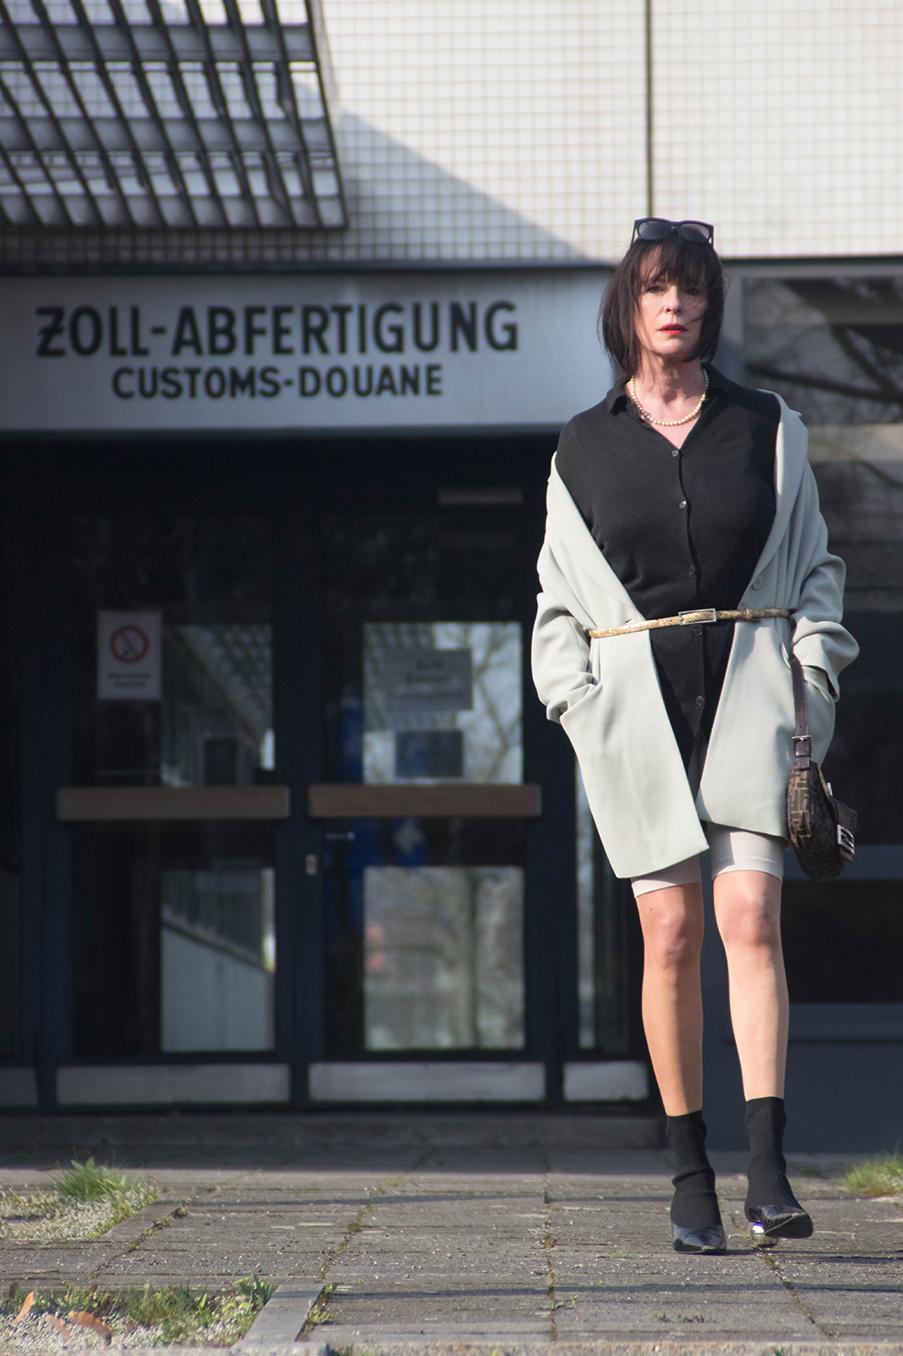 Outfit Bike Shorts, Cycling Pants Drei Linden Grenzübergang-26.1